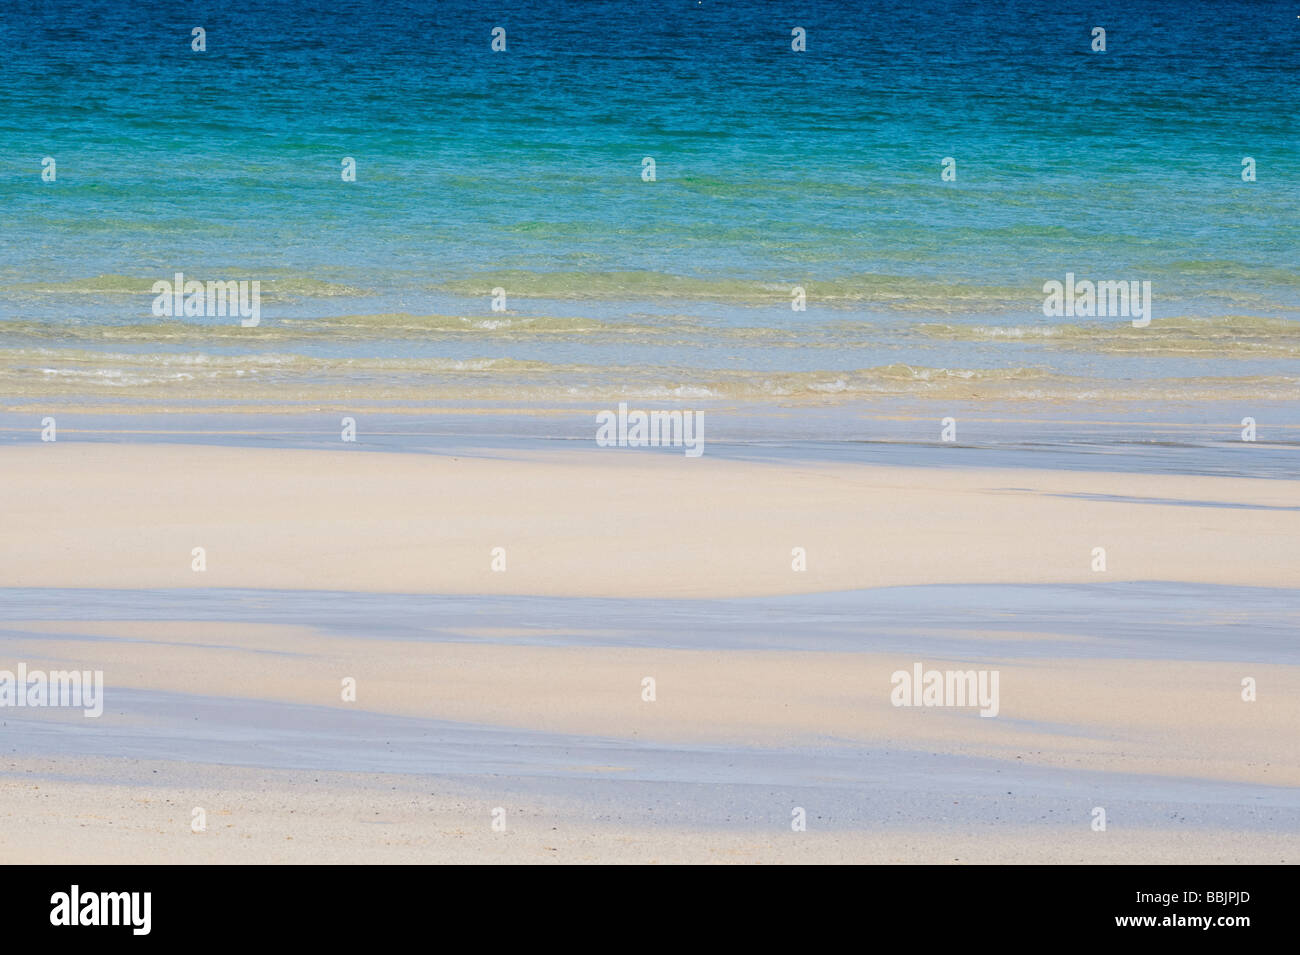 Traigh Scarista beach, Isle of Harris, Outer Hebrides, Scotland - Stock Image